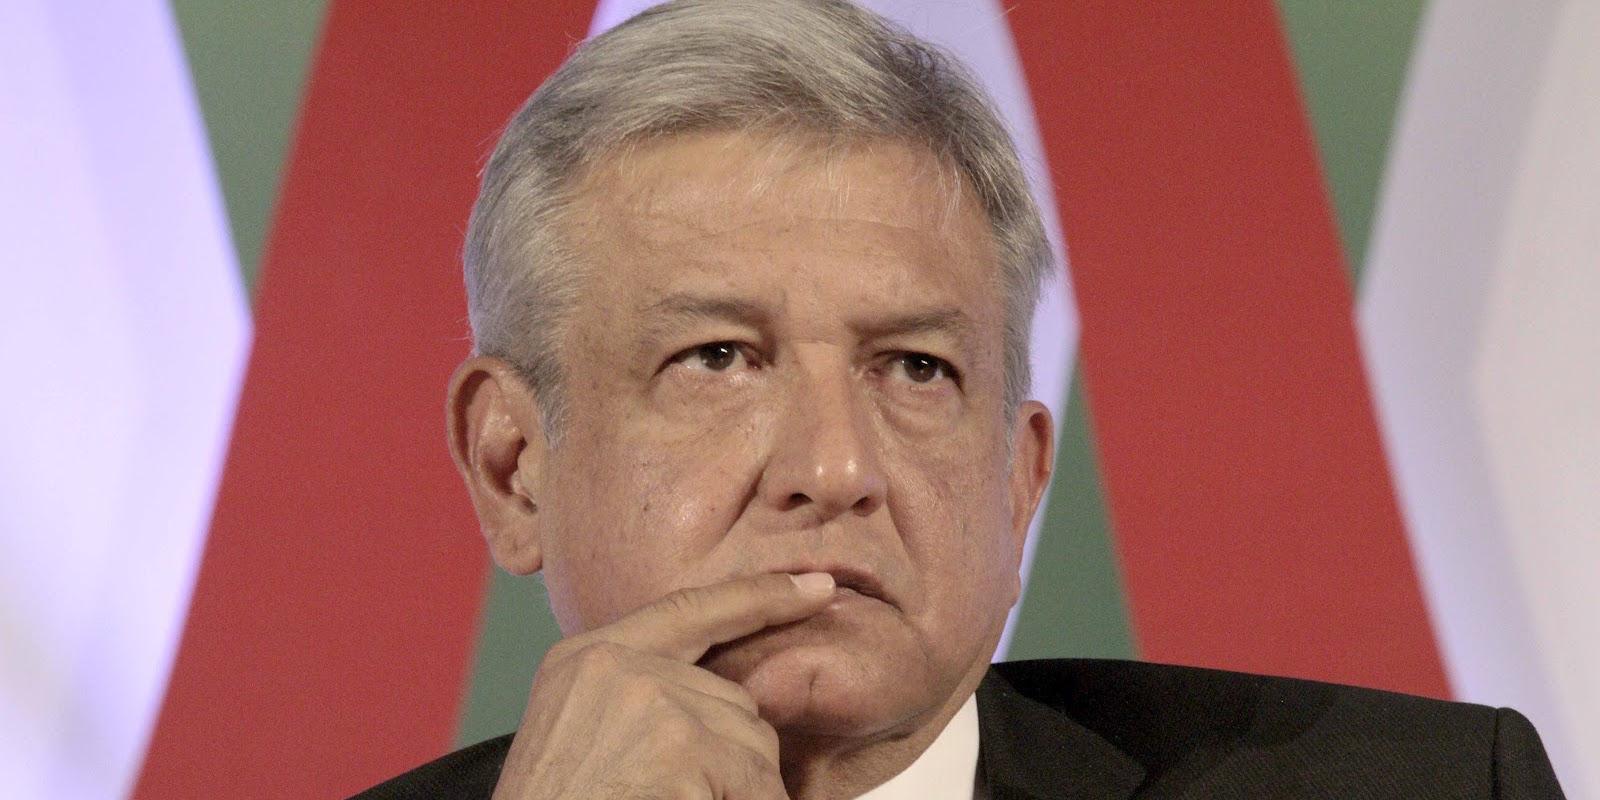 Un Mexicain sans sombrero sur le nez ? - <i>À propos d'Andrés Manuel López Obrador</i>